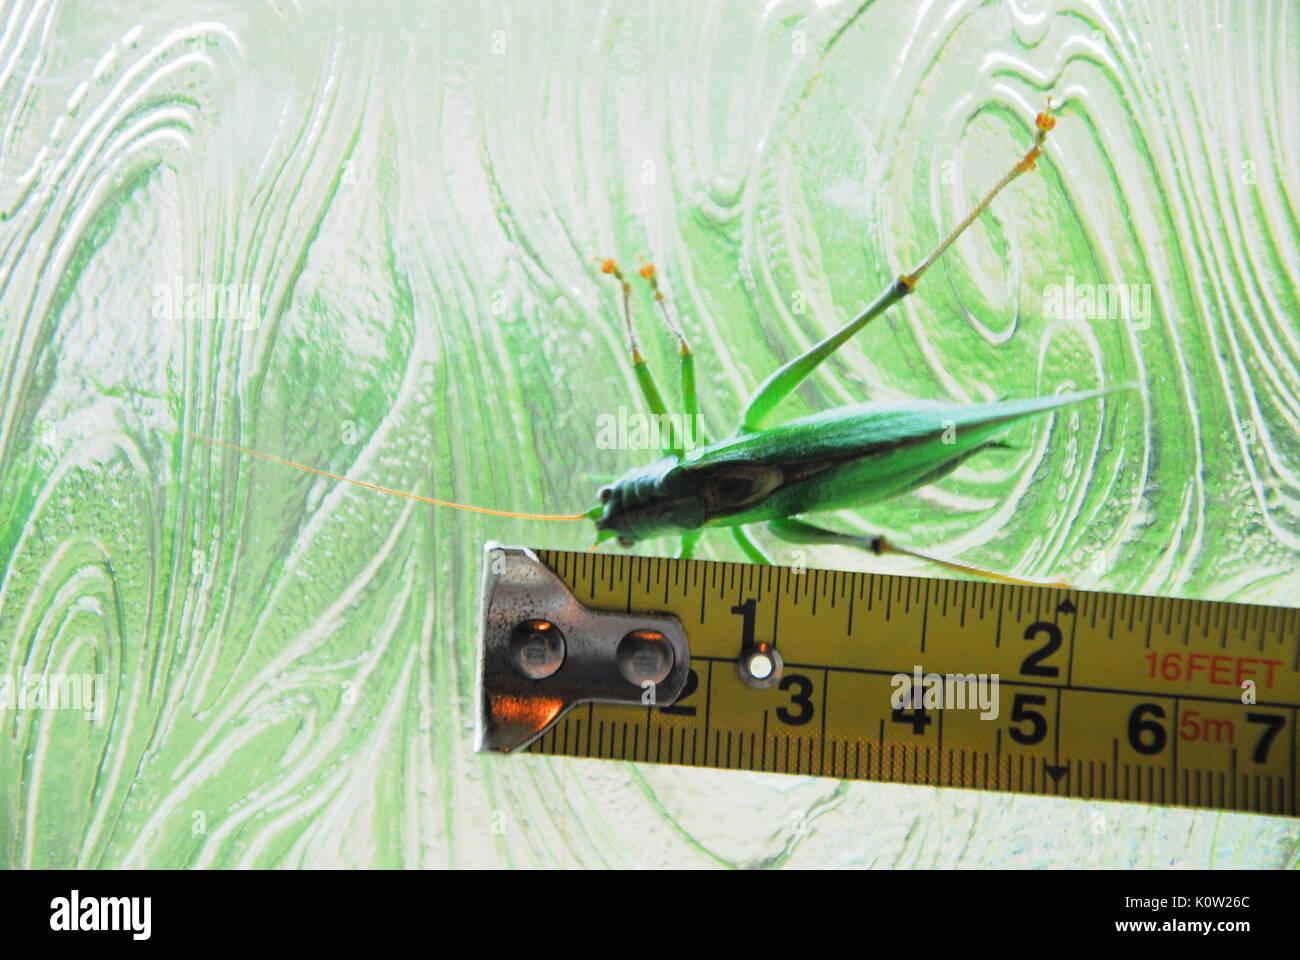 Fortuneswell, Dorset, Großbritannien. 24 Aug, 2017. Warmes Wetter bringt ein Mann großen Green Bush Cricket (Tettigonia Viridissima) im Fortuneswell, Isle of Portland, dieses Exemplar misst 5 cm nose-to-tail Credit: stuart Hartmut Ost/Alamy leben Nachrichten Stockbild